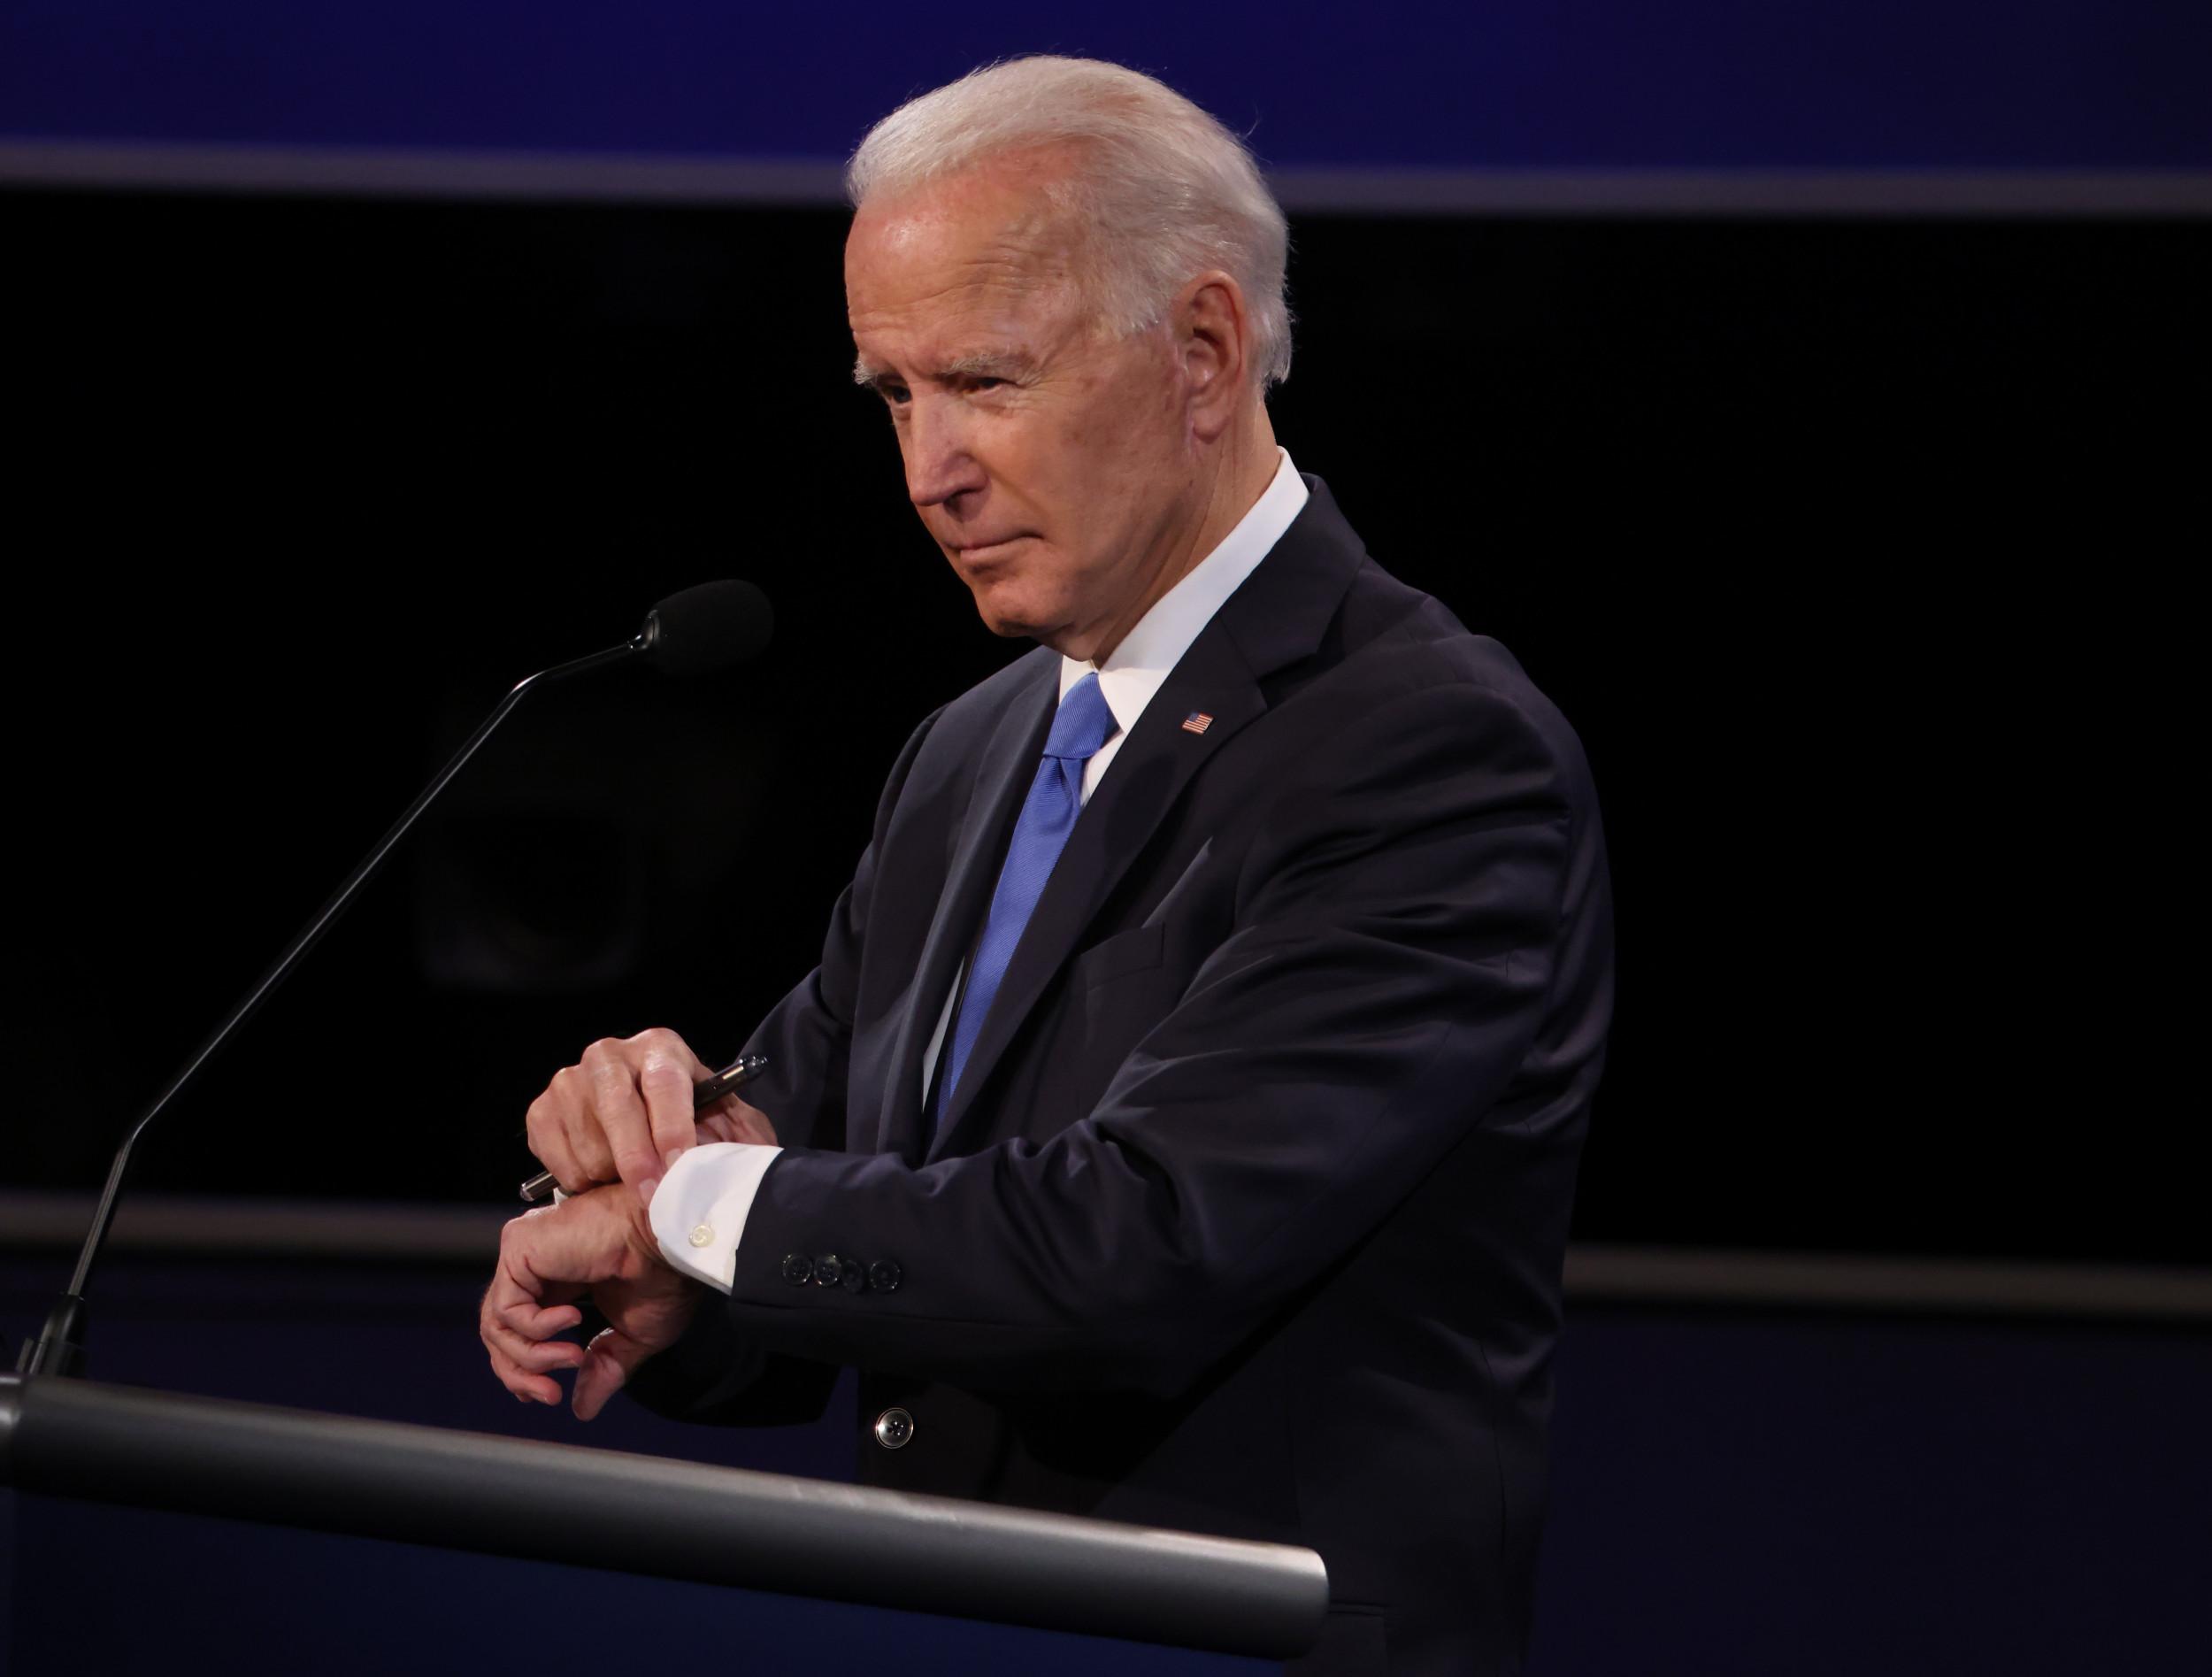 Joe Biden looking at his watch during debate sparks jokes, Republican outrage